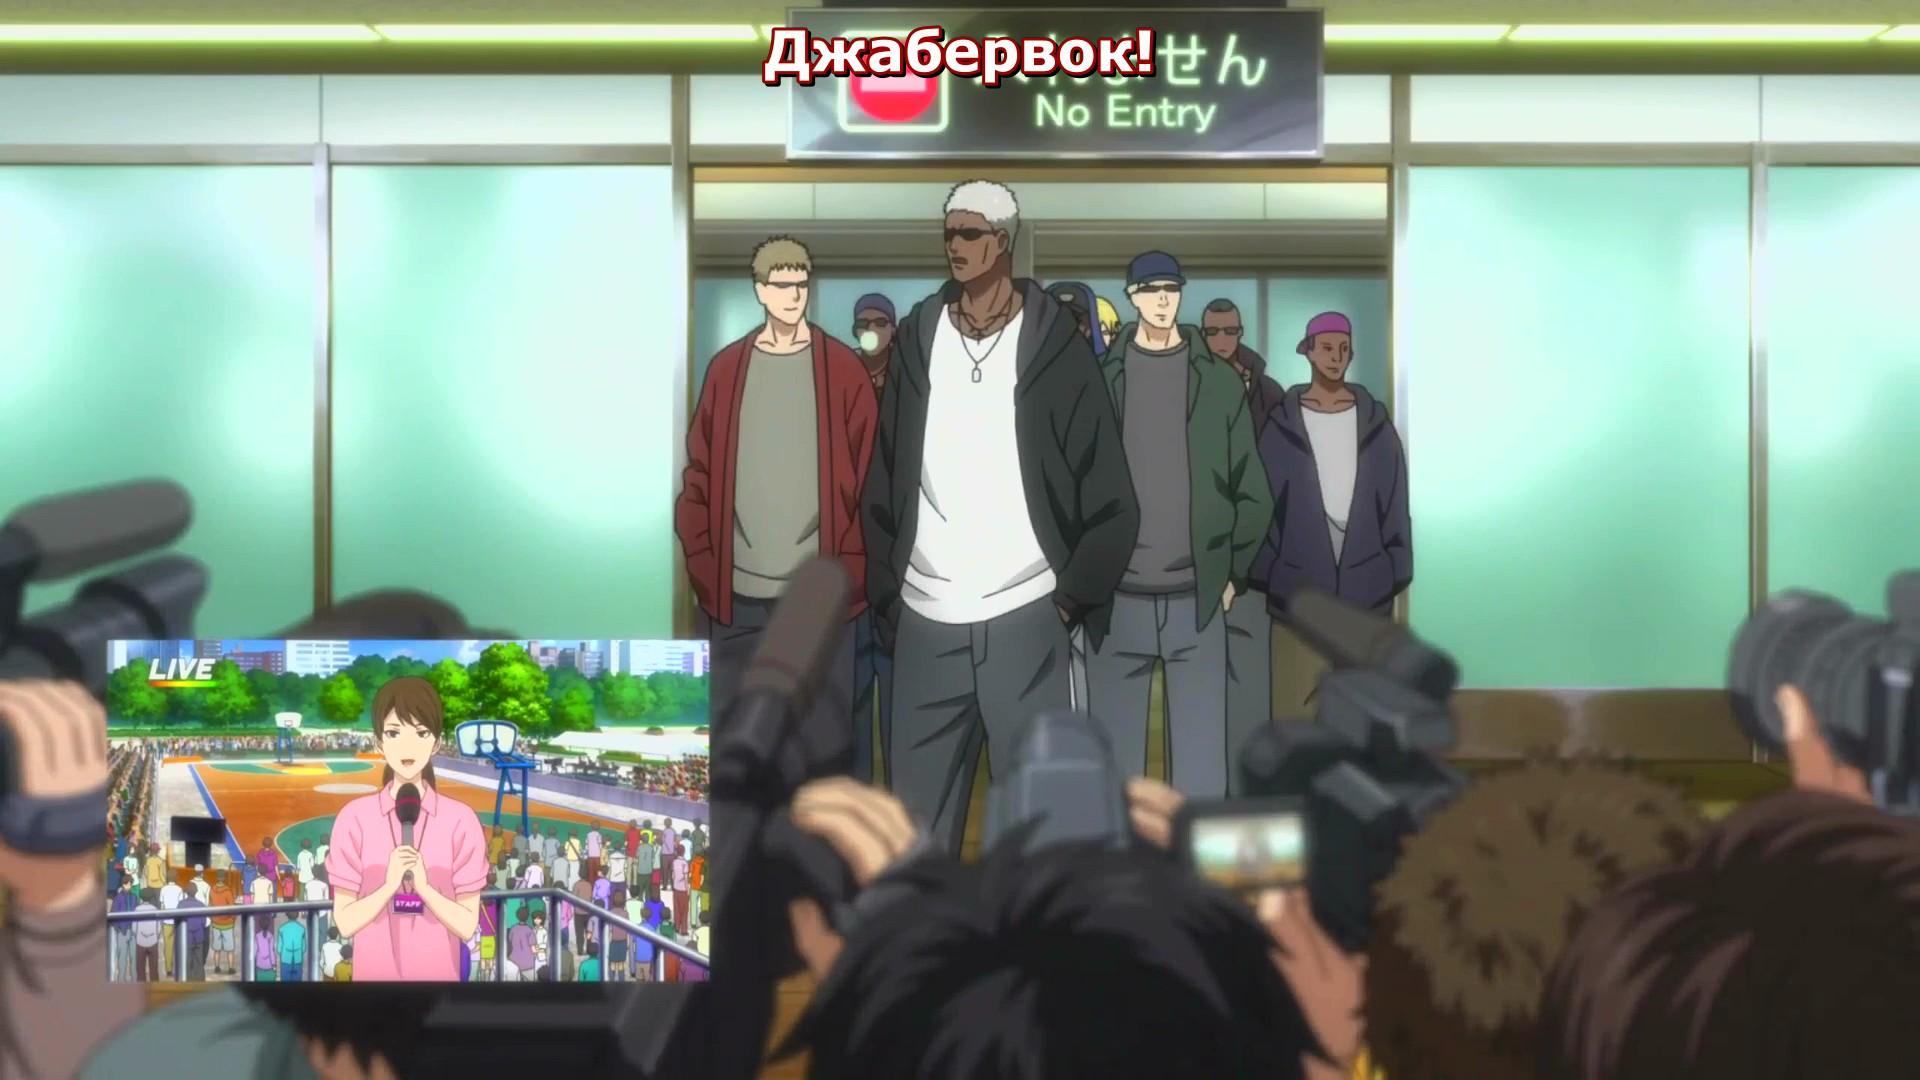 Баскетбол Куроко: Фильм Последняя игра / Gekijouban Kuroko no basuke: Last Game (2017) WEBRip 1080p